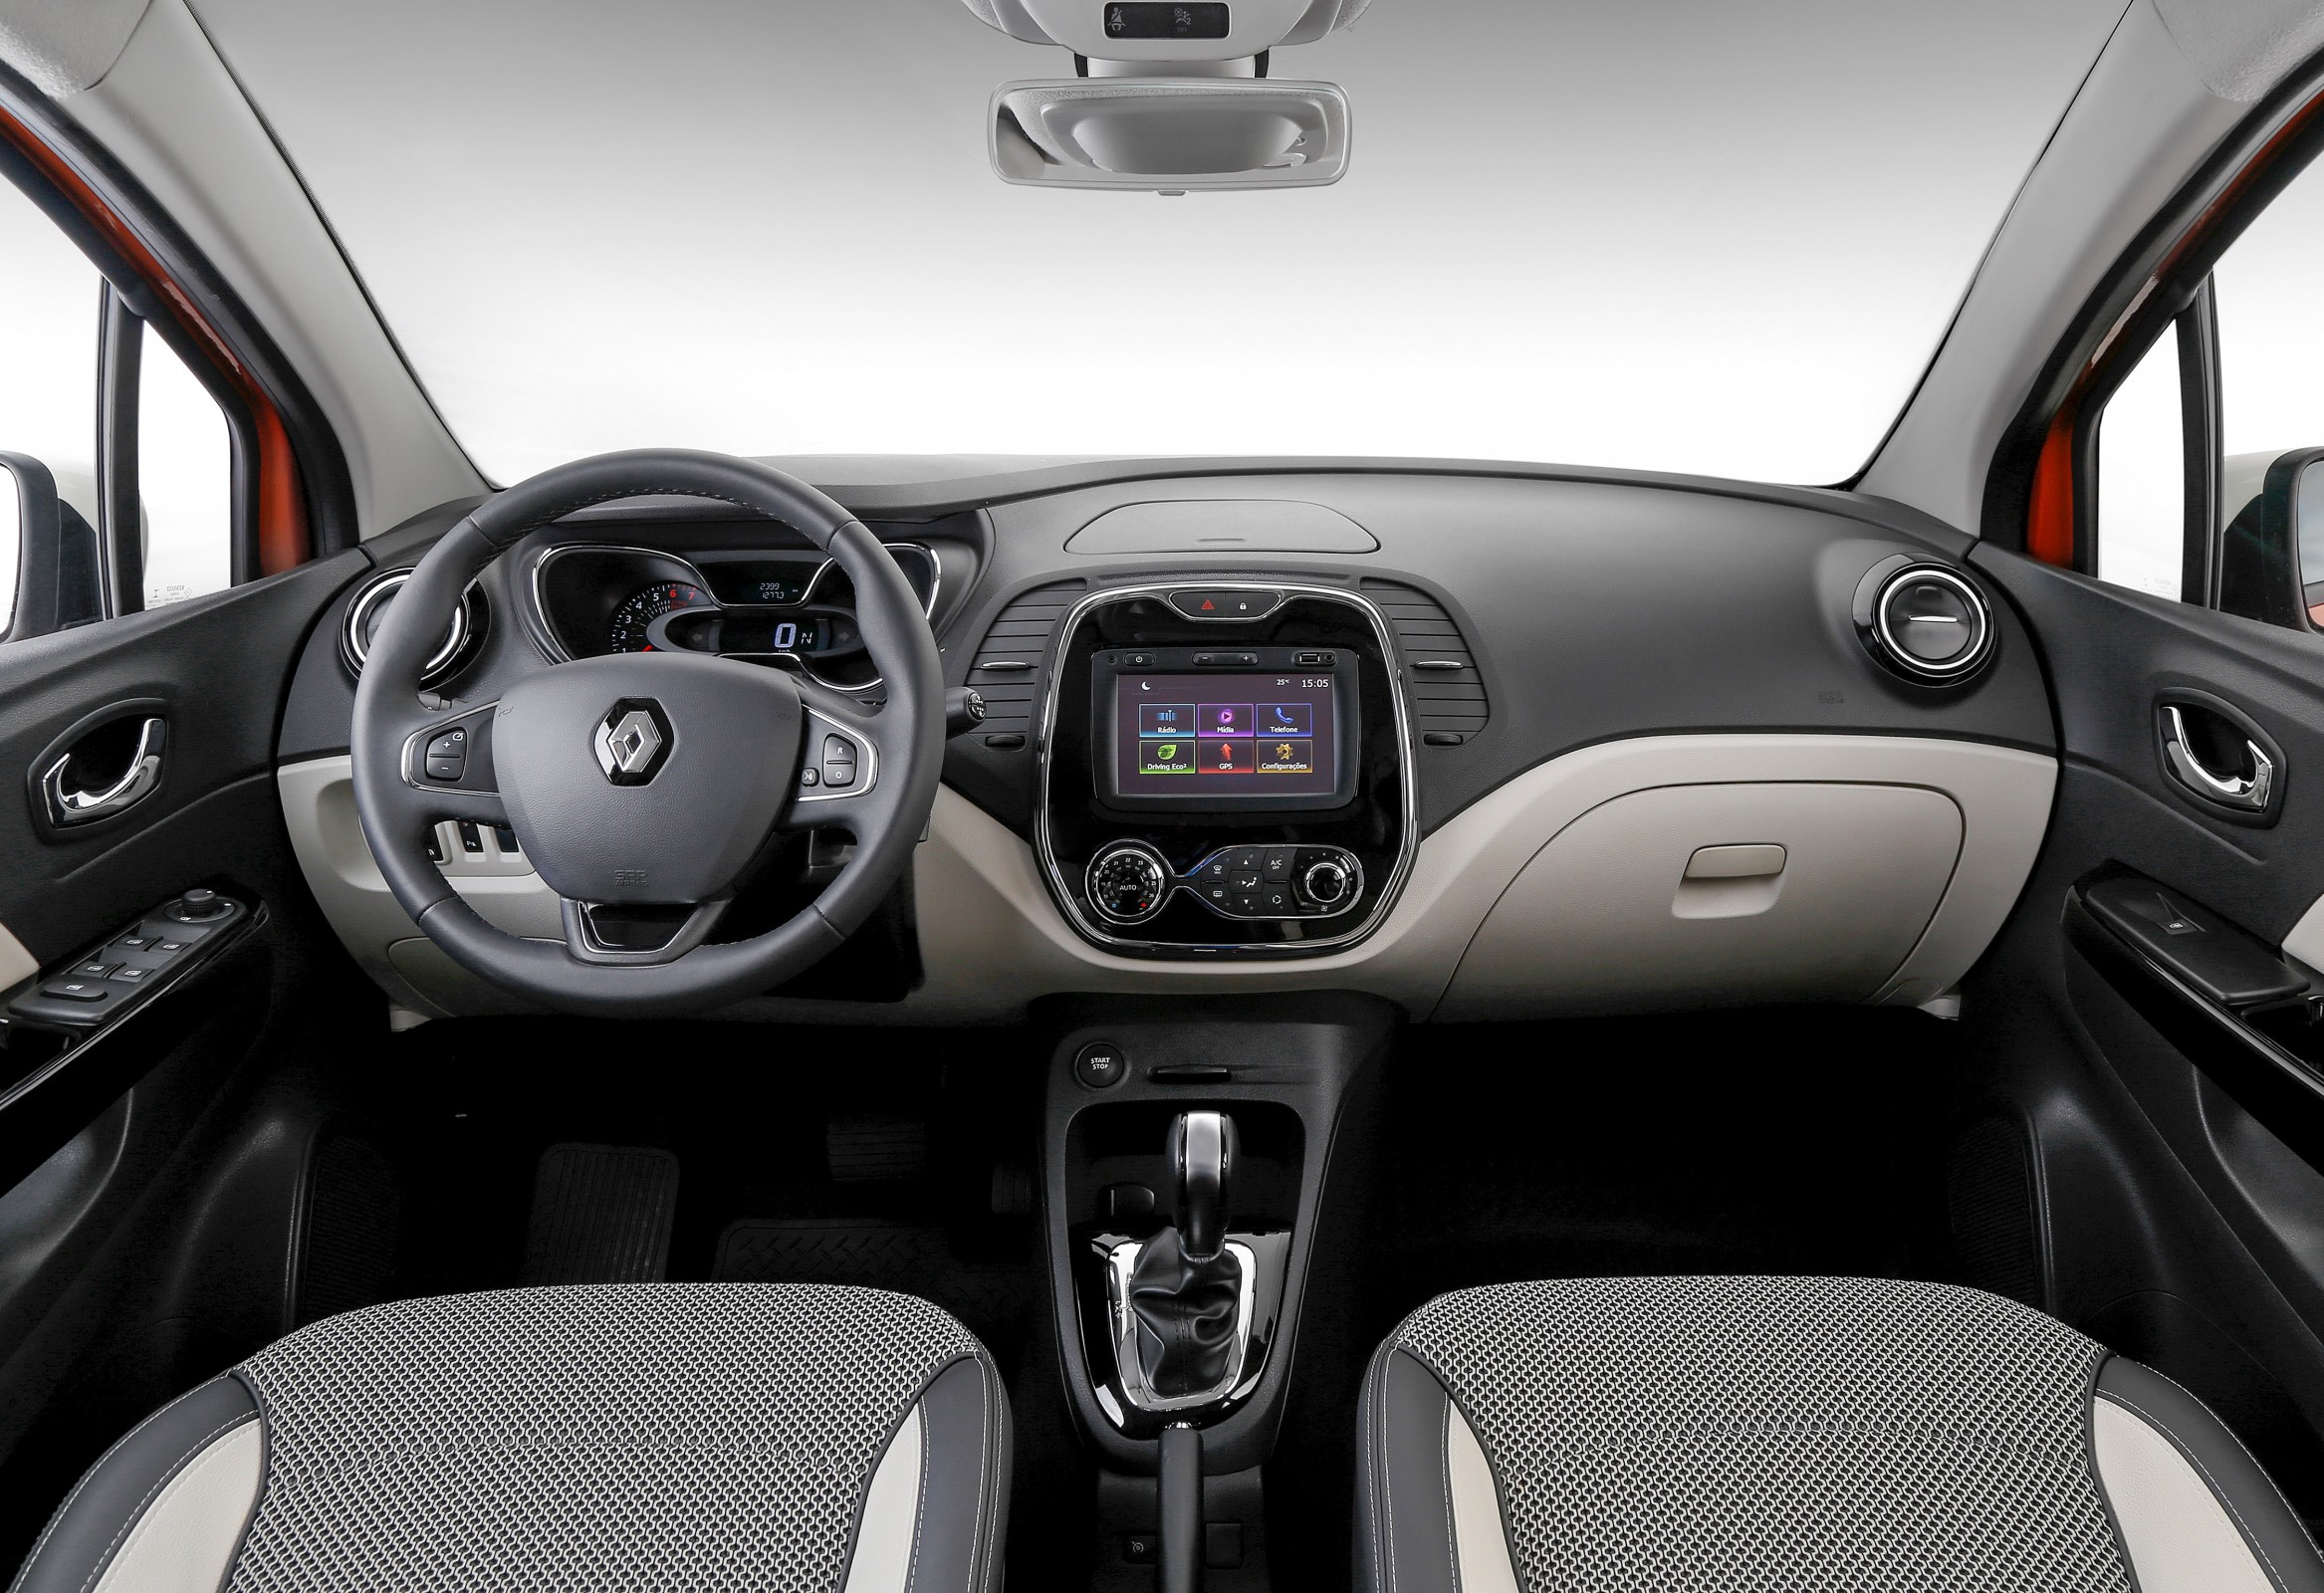 Renault Captur 1.6 Sce CVT